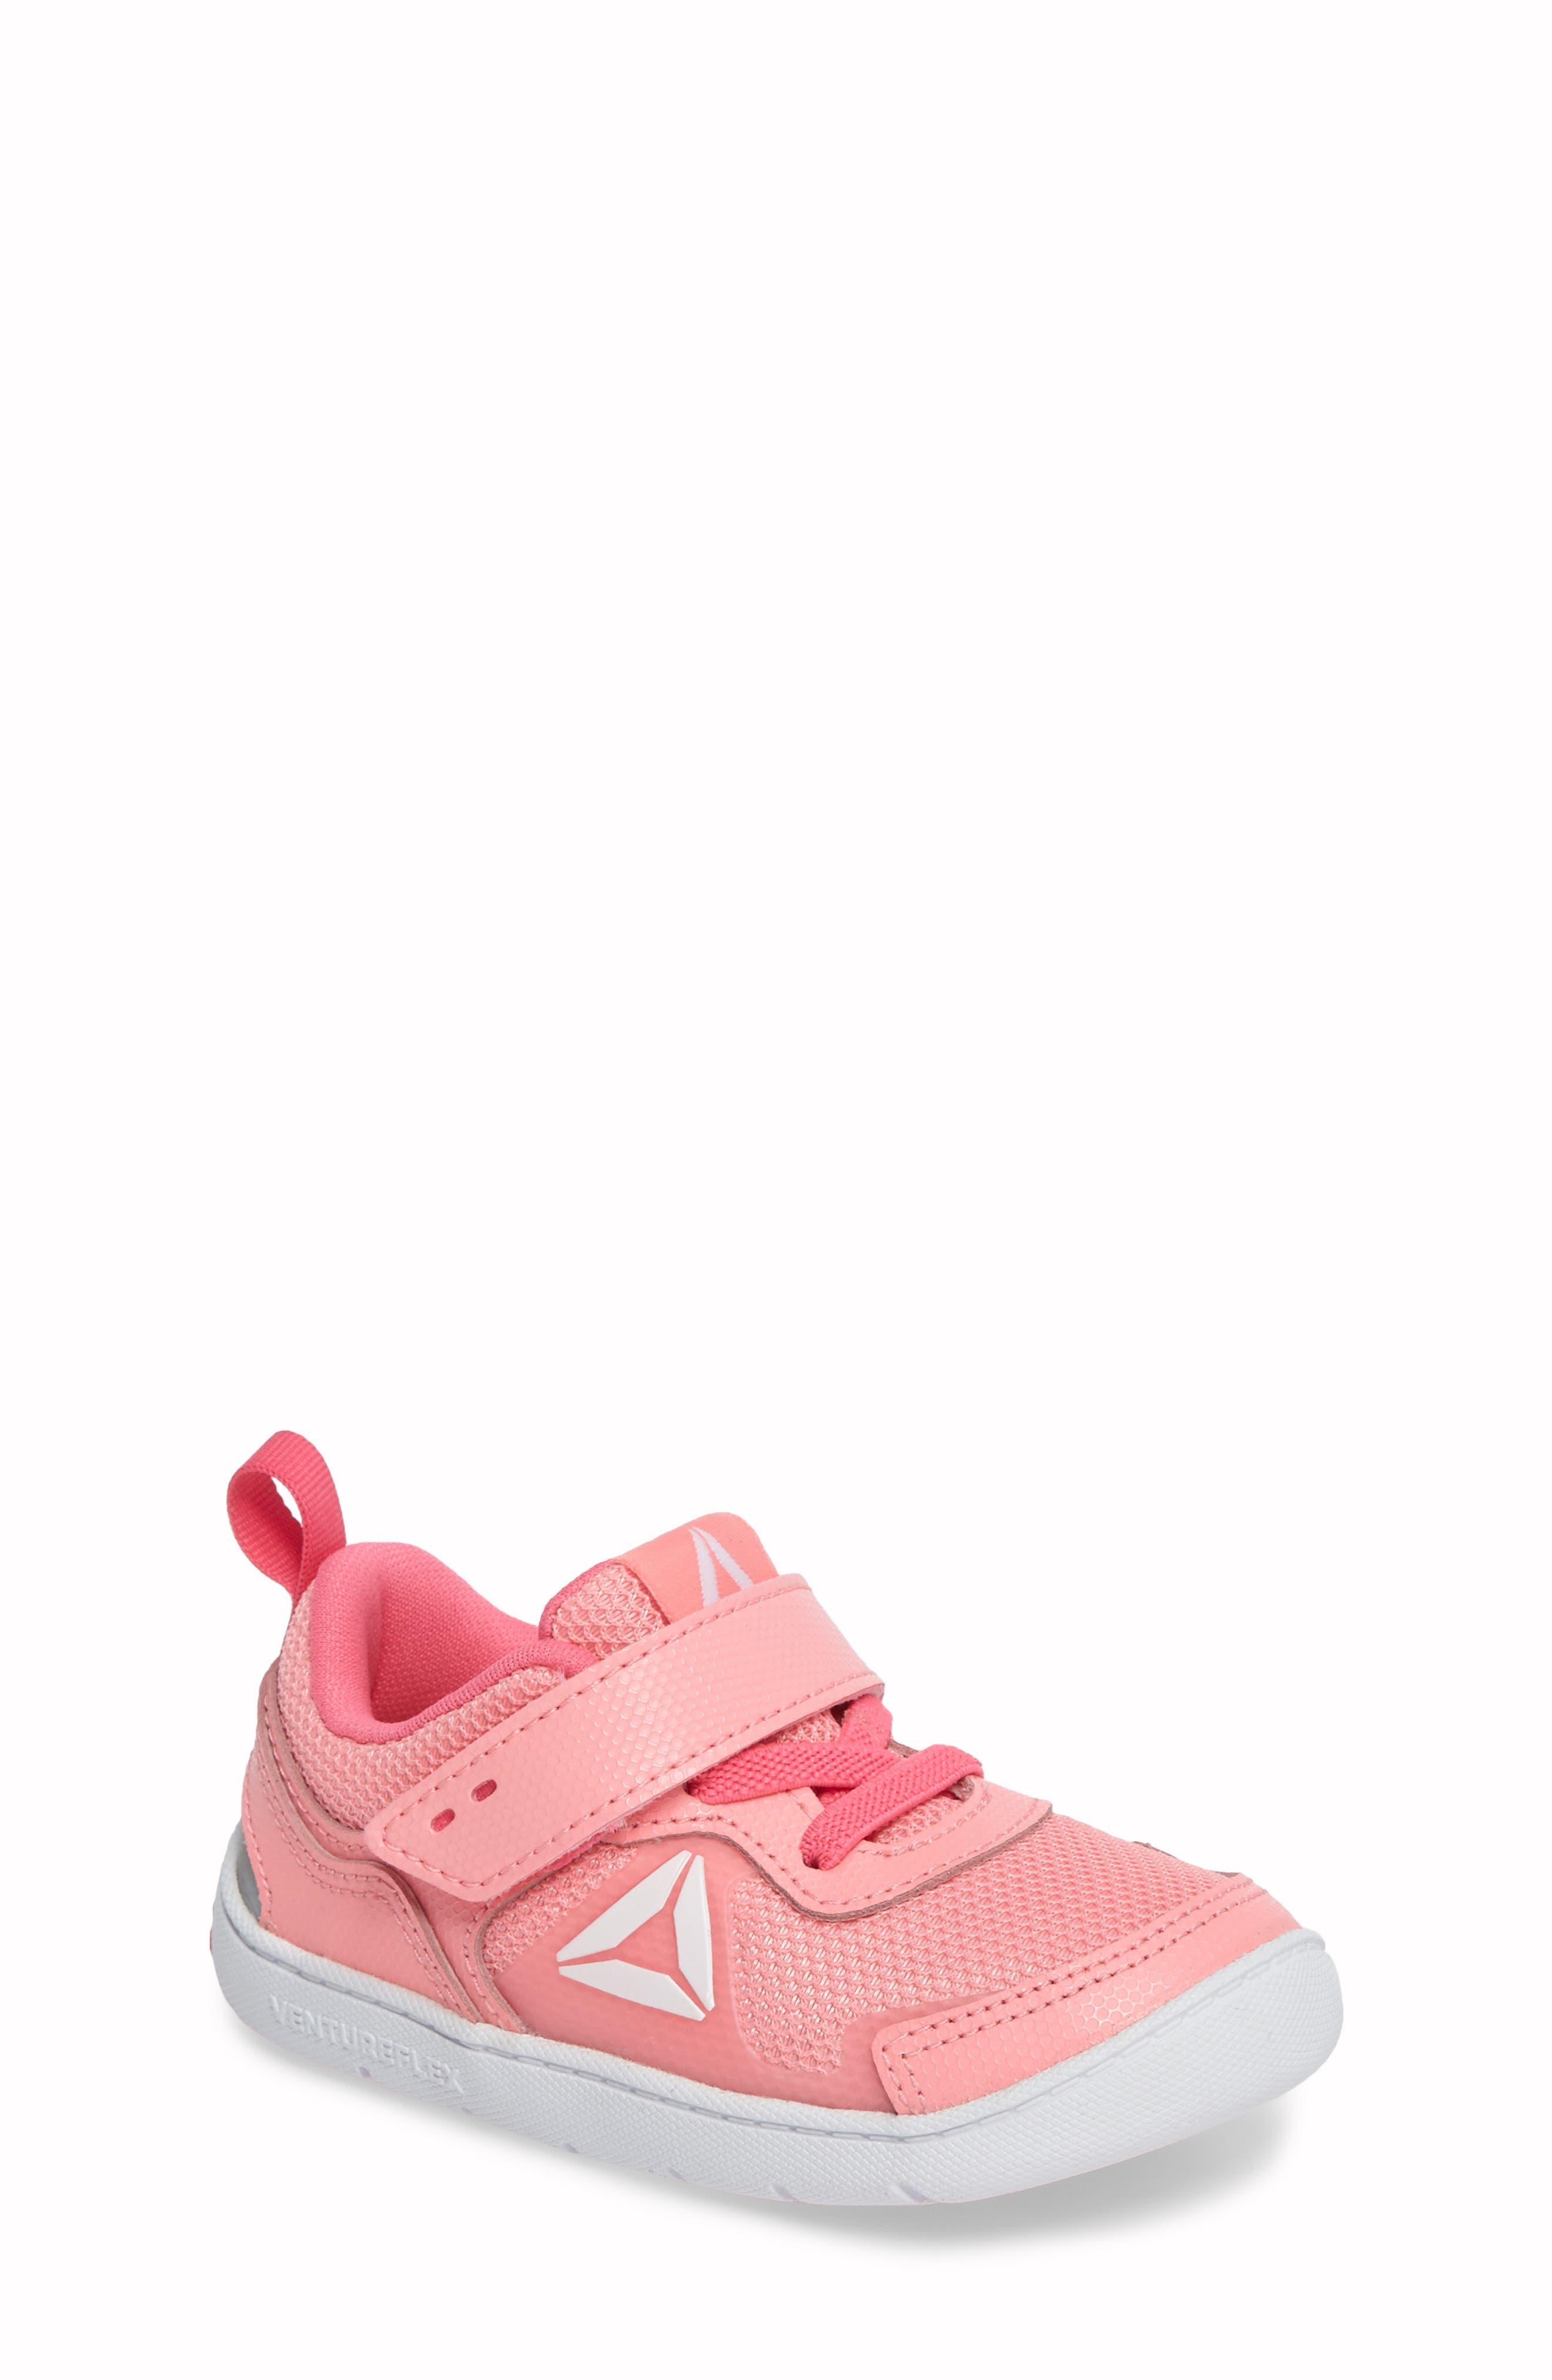 Reebok Ventureflex Stride 5.0 Sneaker (Baby, Walker & Toddler)